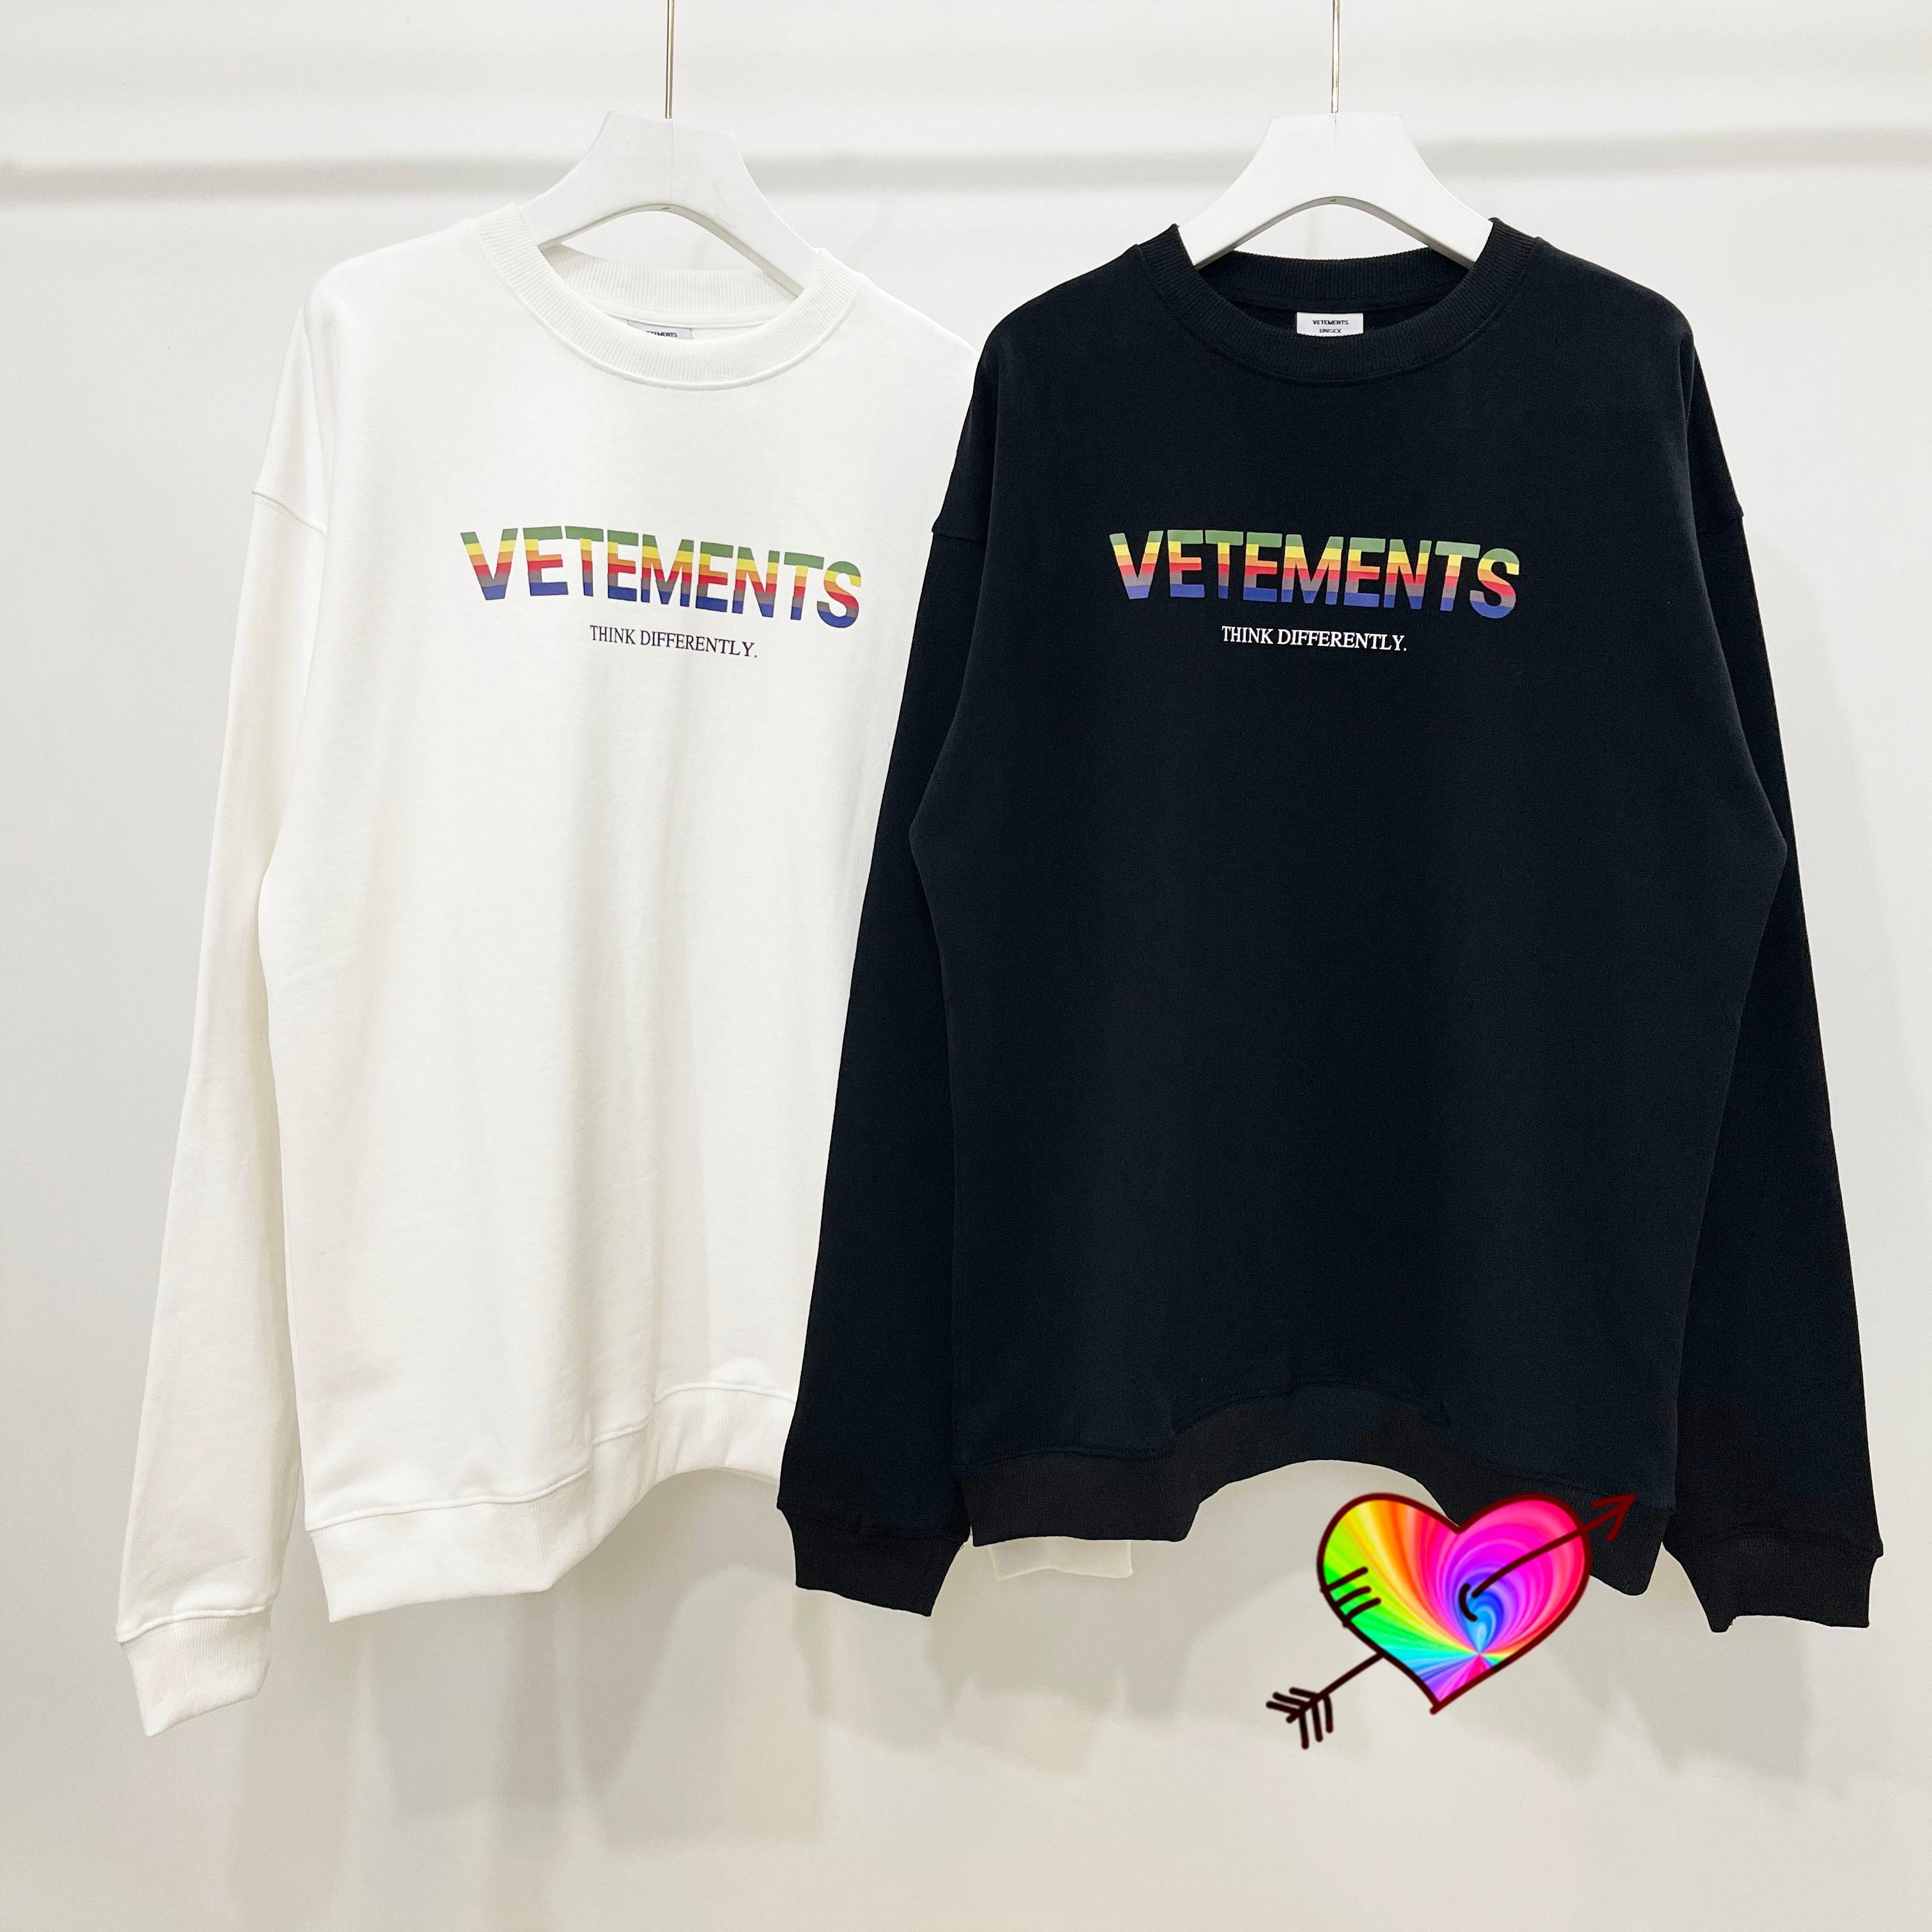 2021FW متعدد الألوان شعار فيتيمنتس البلوز الرجال النساء 1:1 شمسية عالية الجودة على شكل قوس قزح الجرافيك فيتيمنتس هوديي حجم كبير VTM طاقم الرقبة